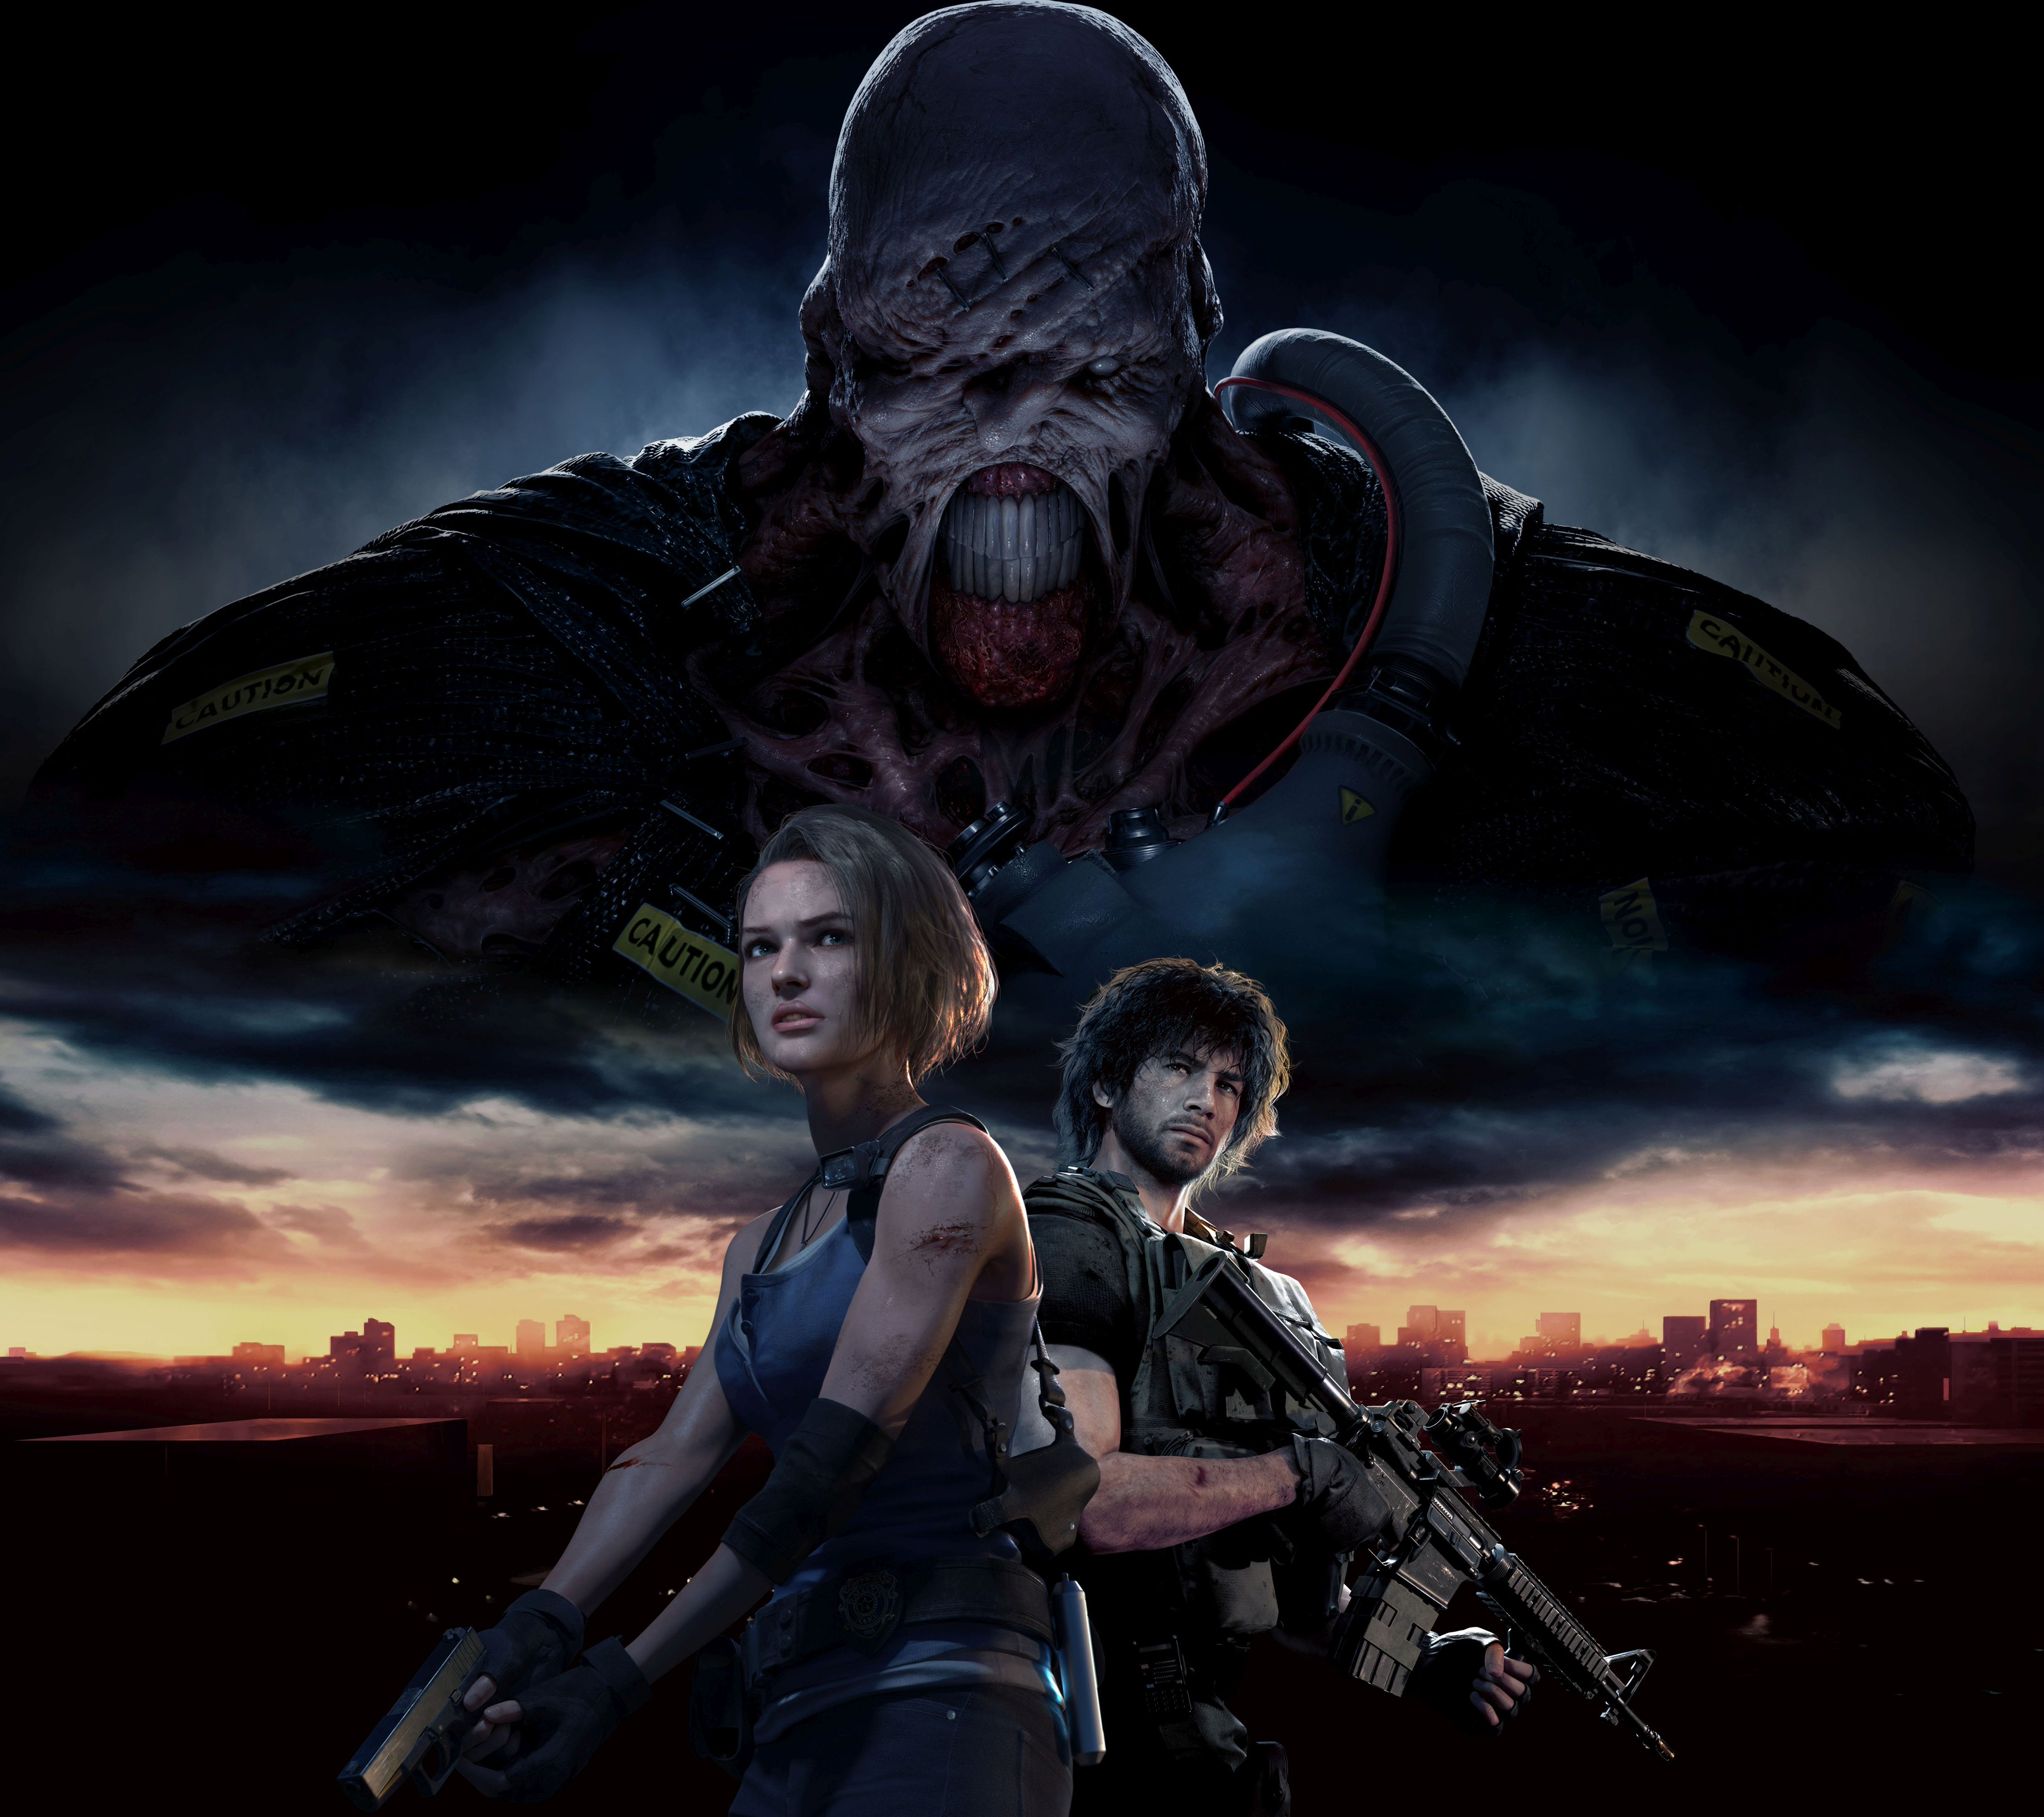 Resident Evil 3 Demo  กำลังจะเปิดให้เล่นเร็วๆ นี้นะจ๊ะอิอิ